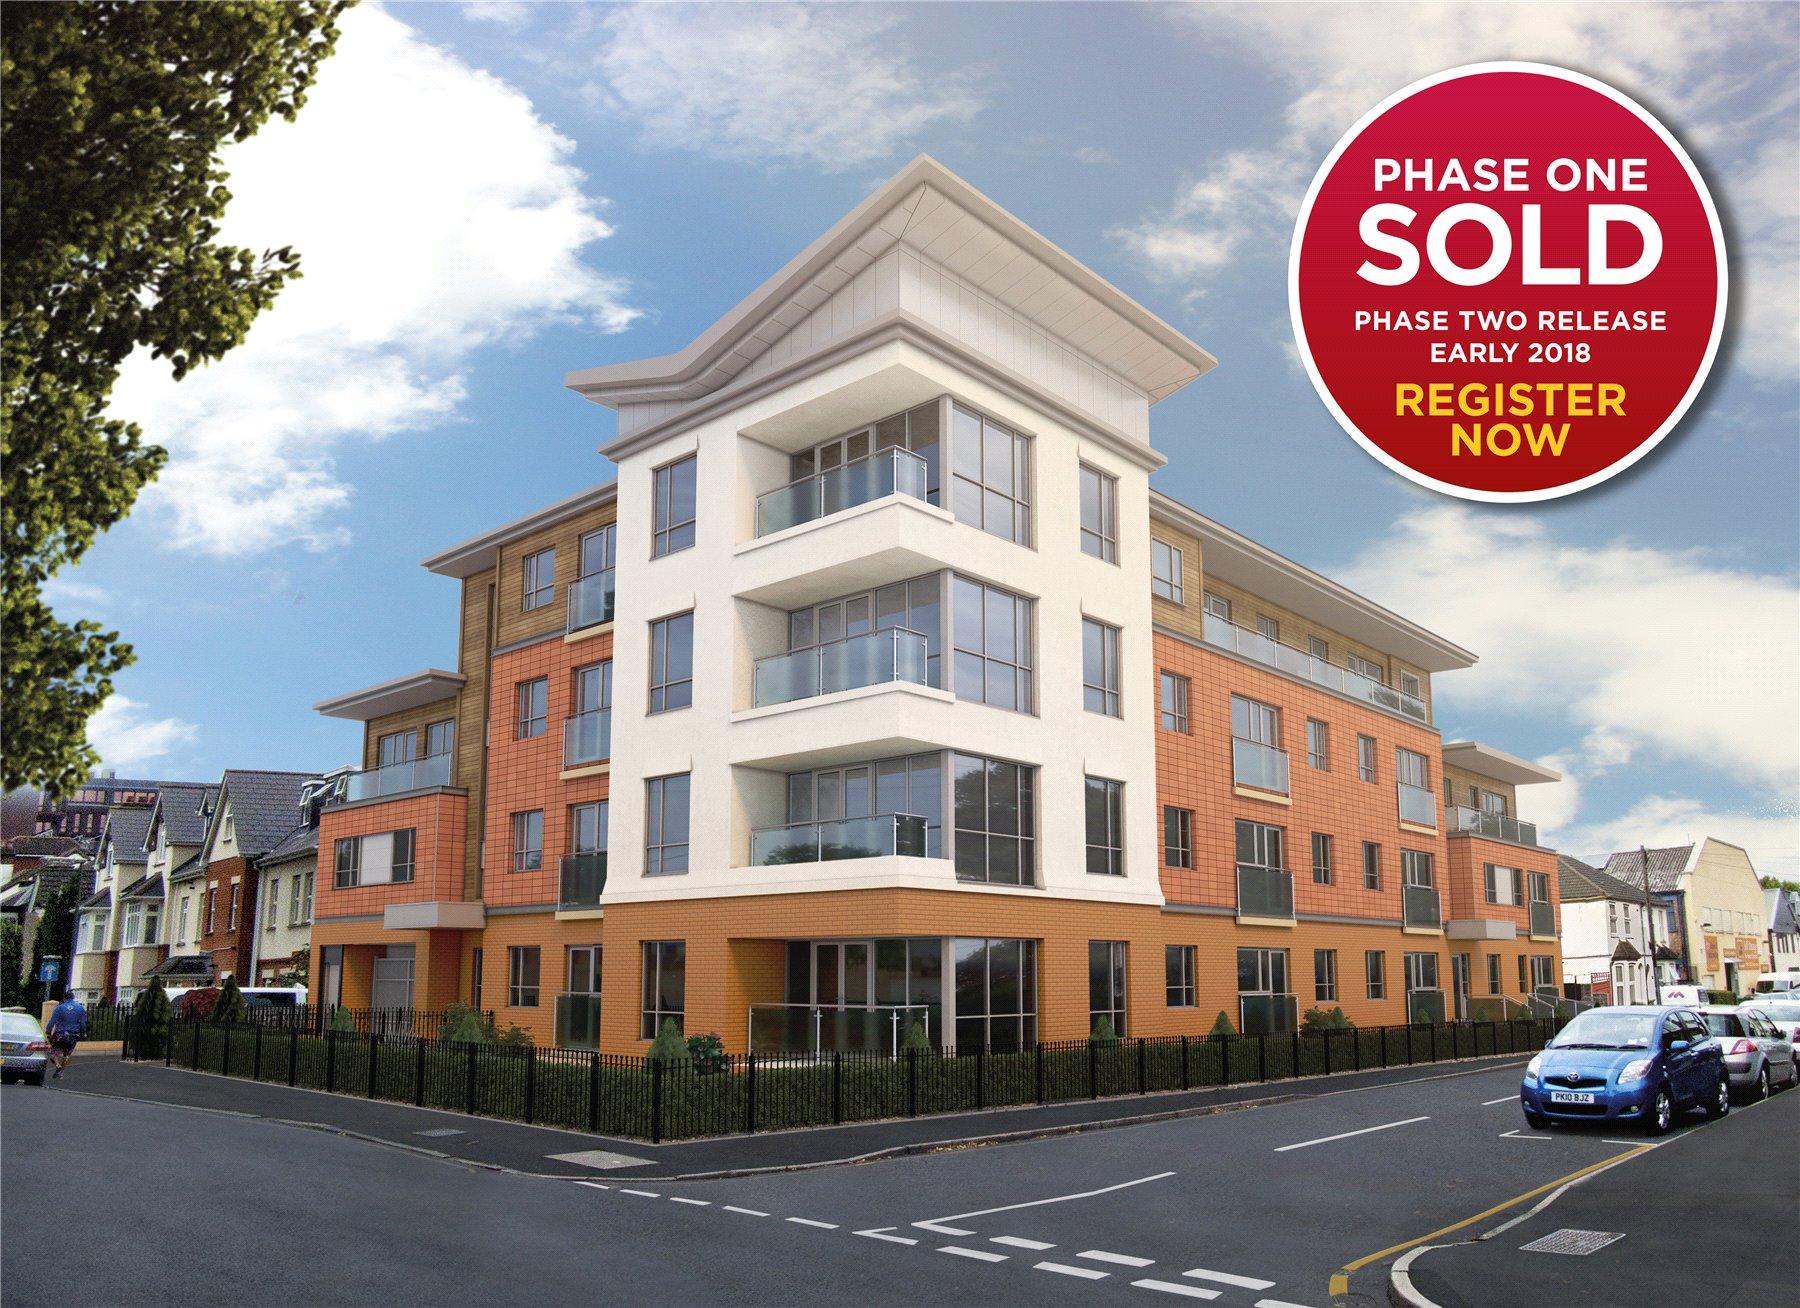 2 Bedrooms Apartment Flat for sale in Maybury Road, Woking, Surrey, GU21